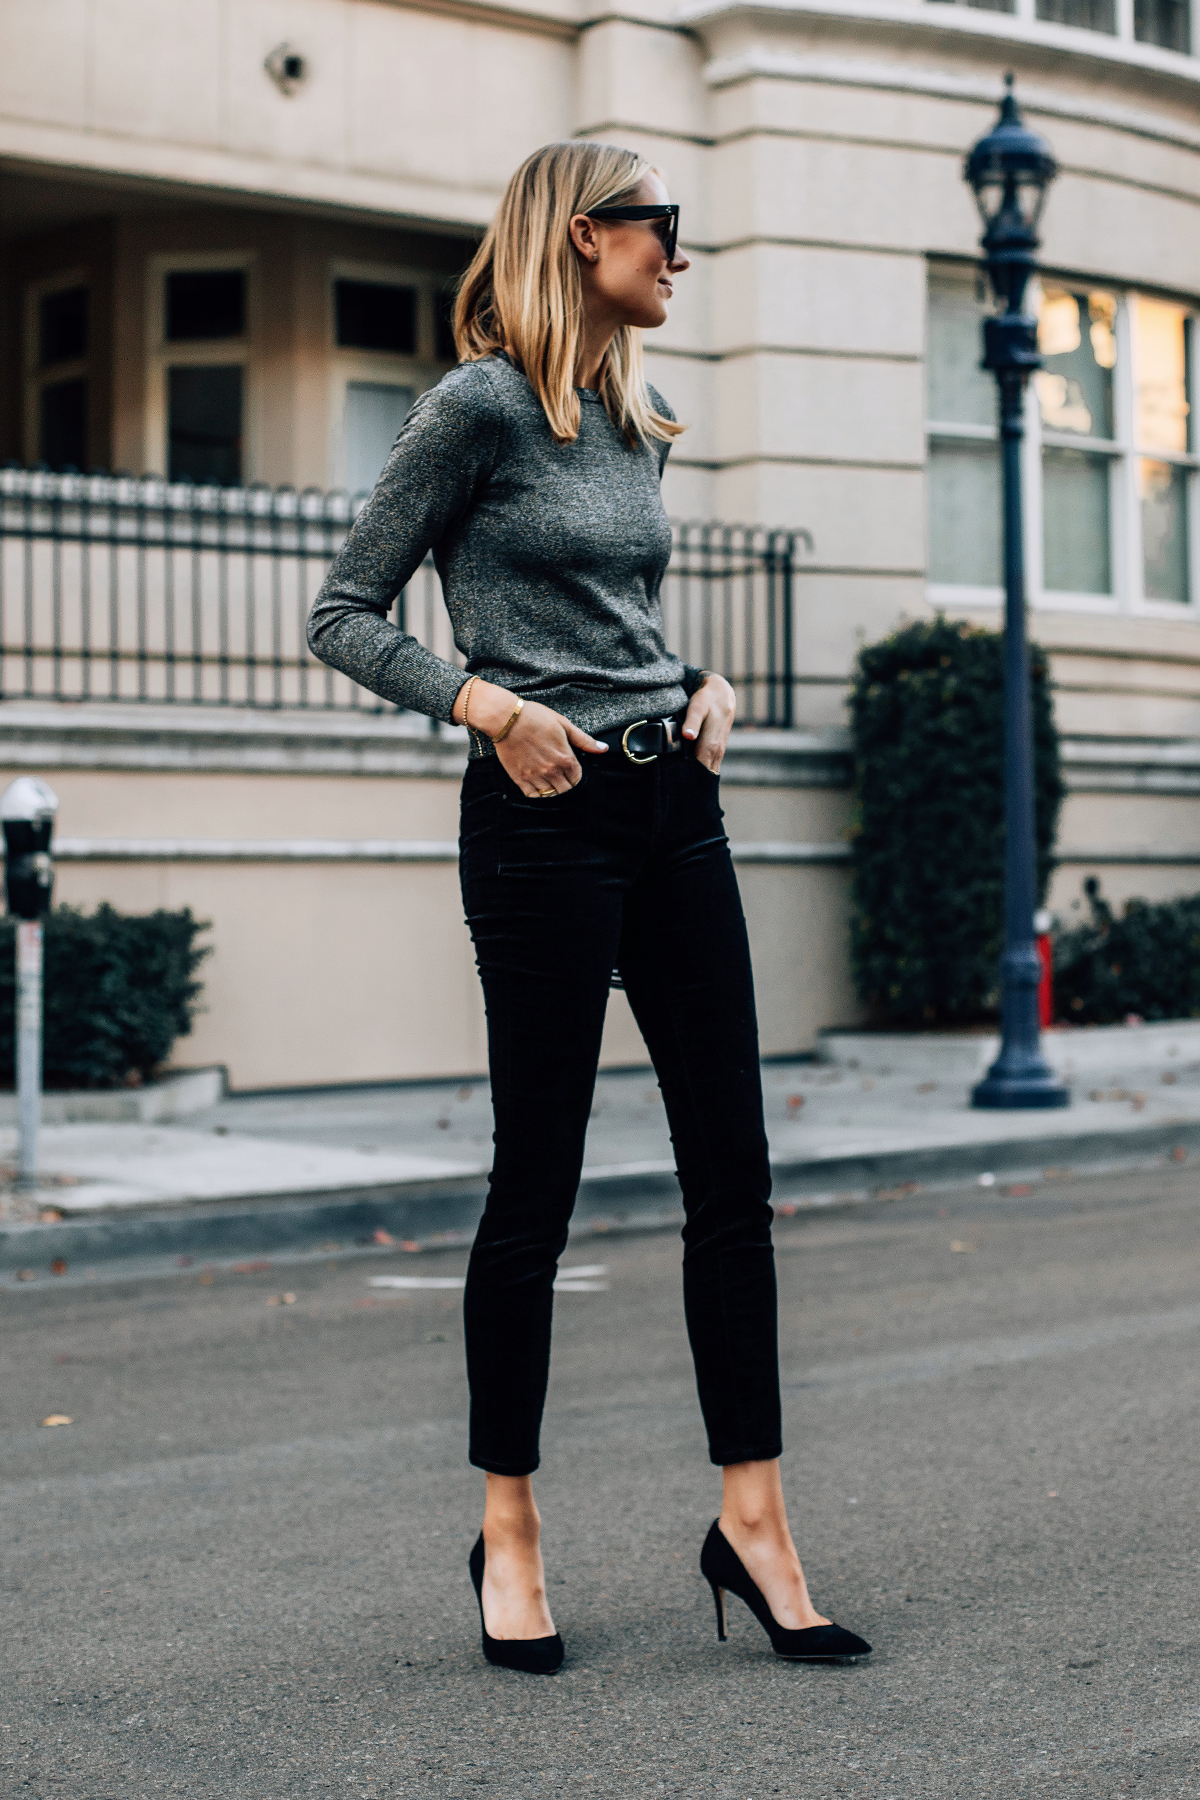 Blonde Woman Wearing Metallic Sweater Black Velvet Jeans Black Suede Pumps Fashion Jackson San Diego Fashion Blogger Street Style